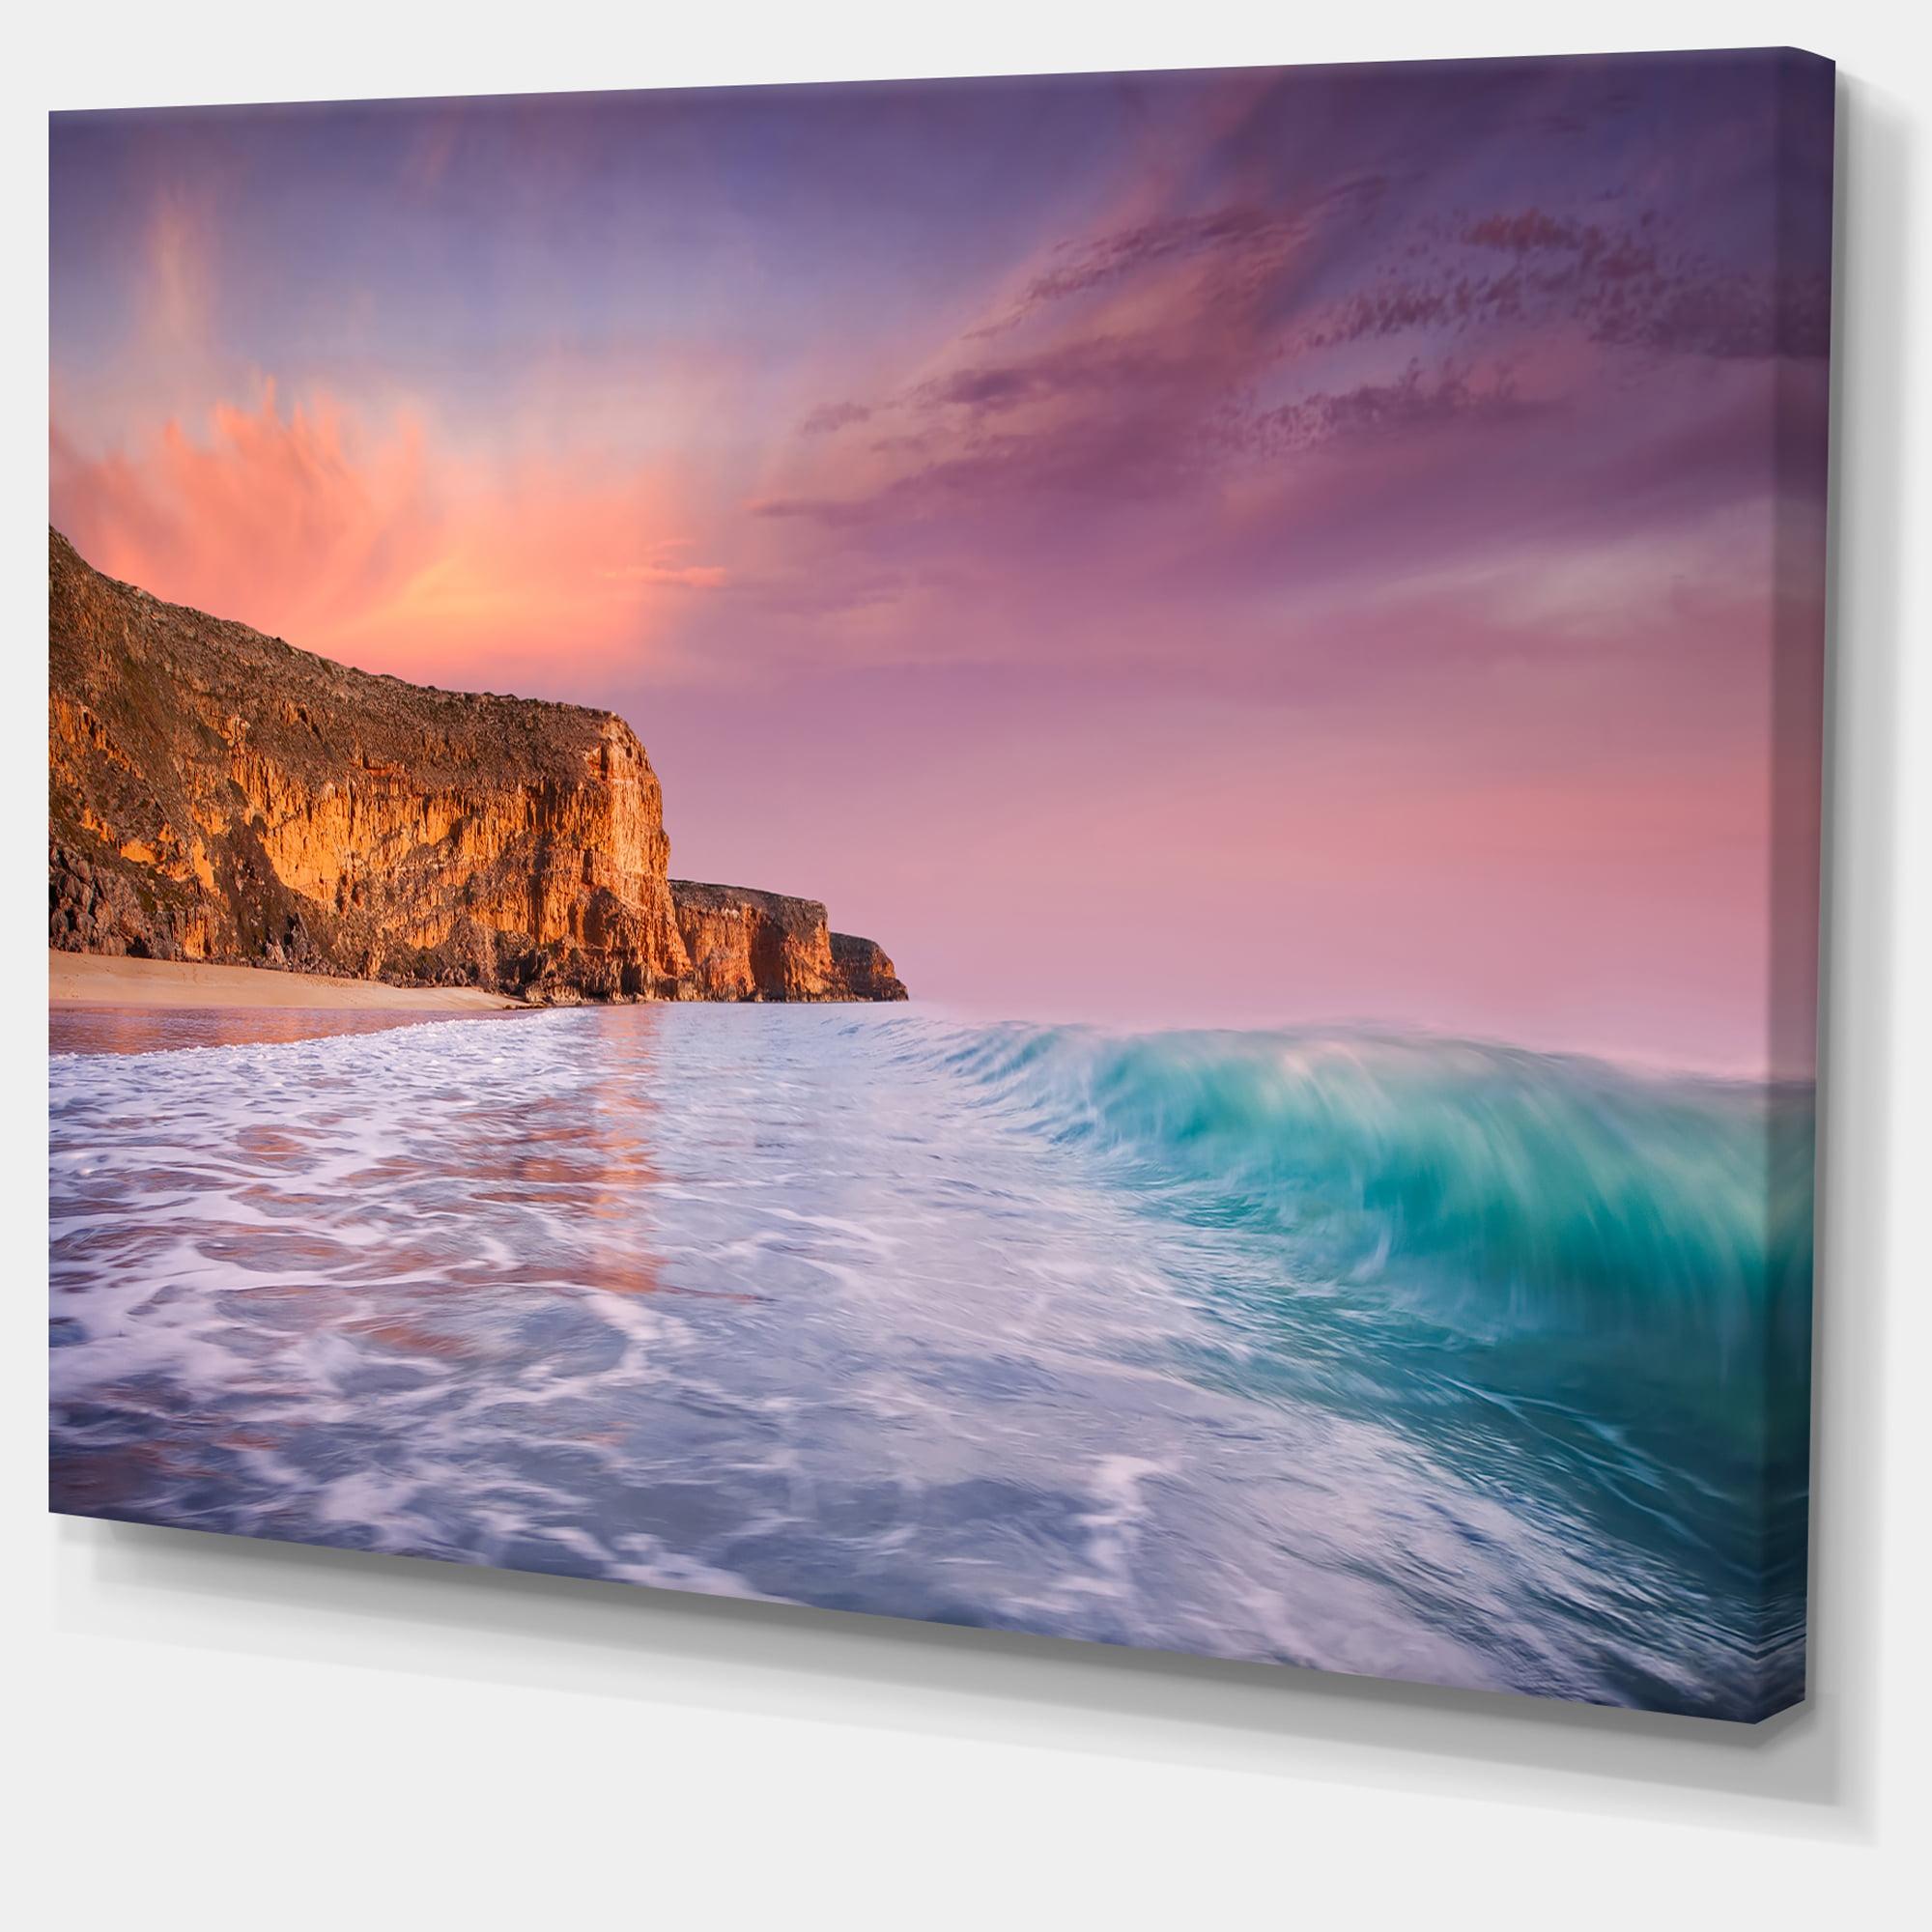 Beautiful Paradise Sunset - Extra Large Seascape Art Canvas - image 1 de 3